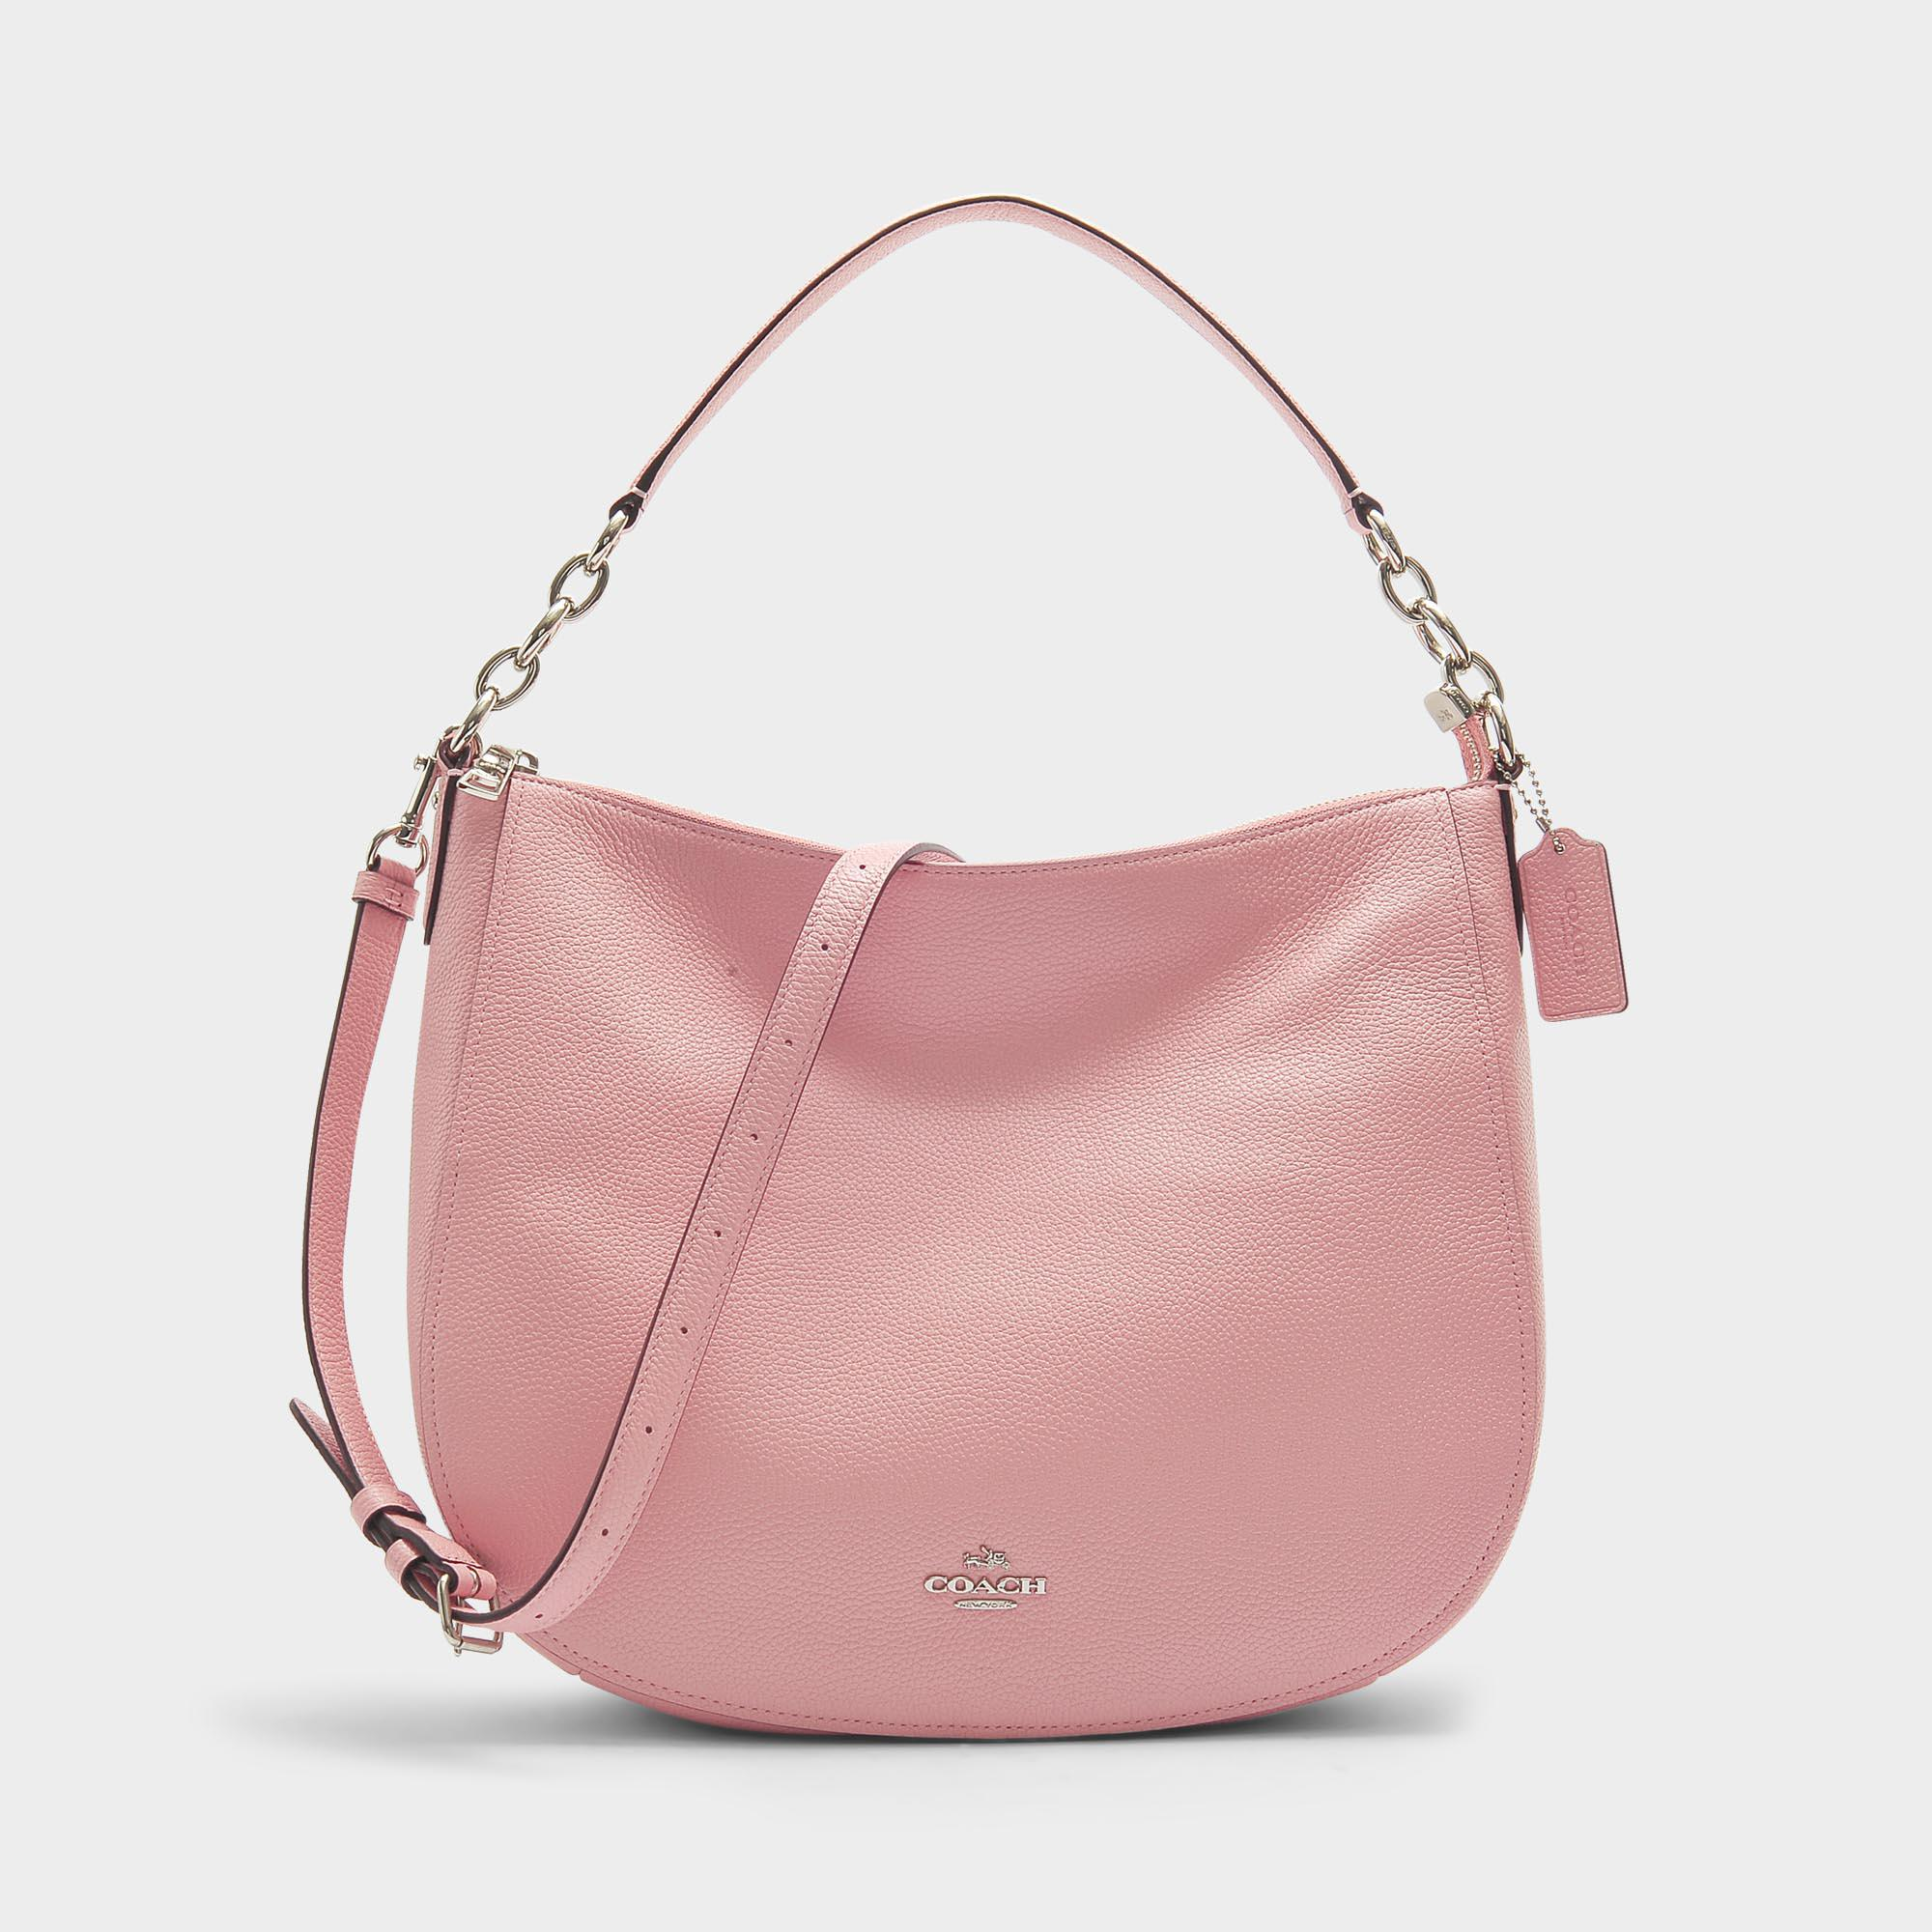 b272e9ab27 COACH Chelsea 32 Hobo Bag In Peony Calfskin in Pink - Lyst